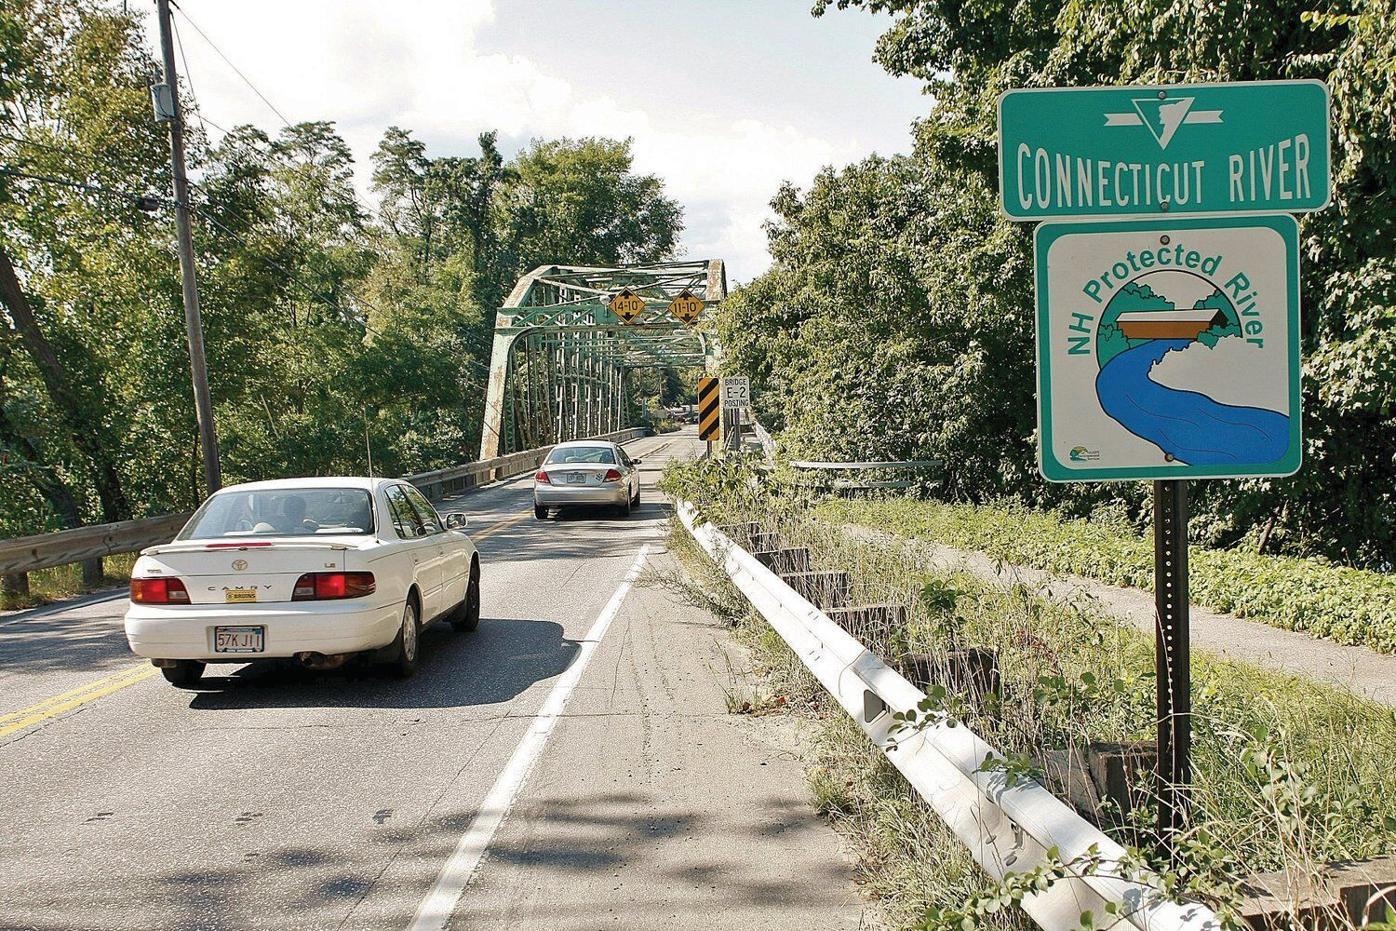 Bridge start date delayed again